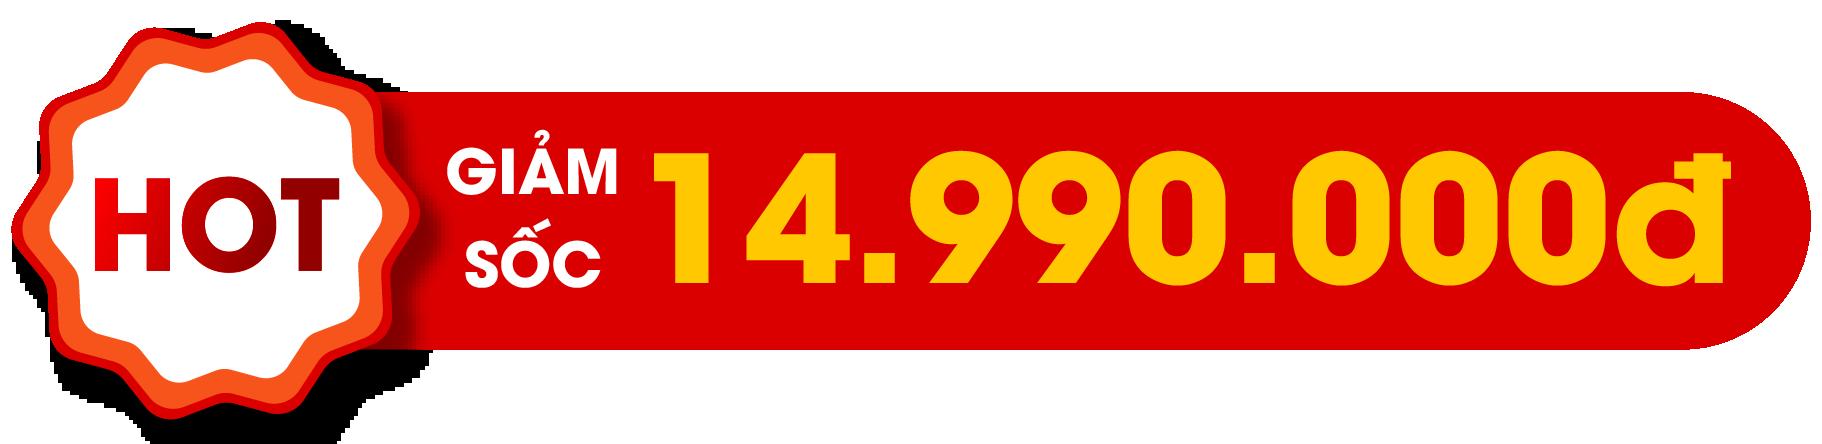 iPhone 11 128GB giá sốc